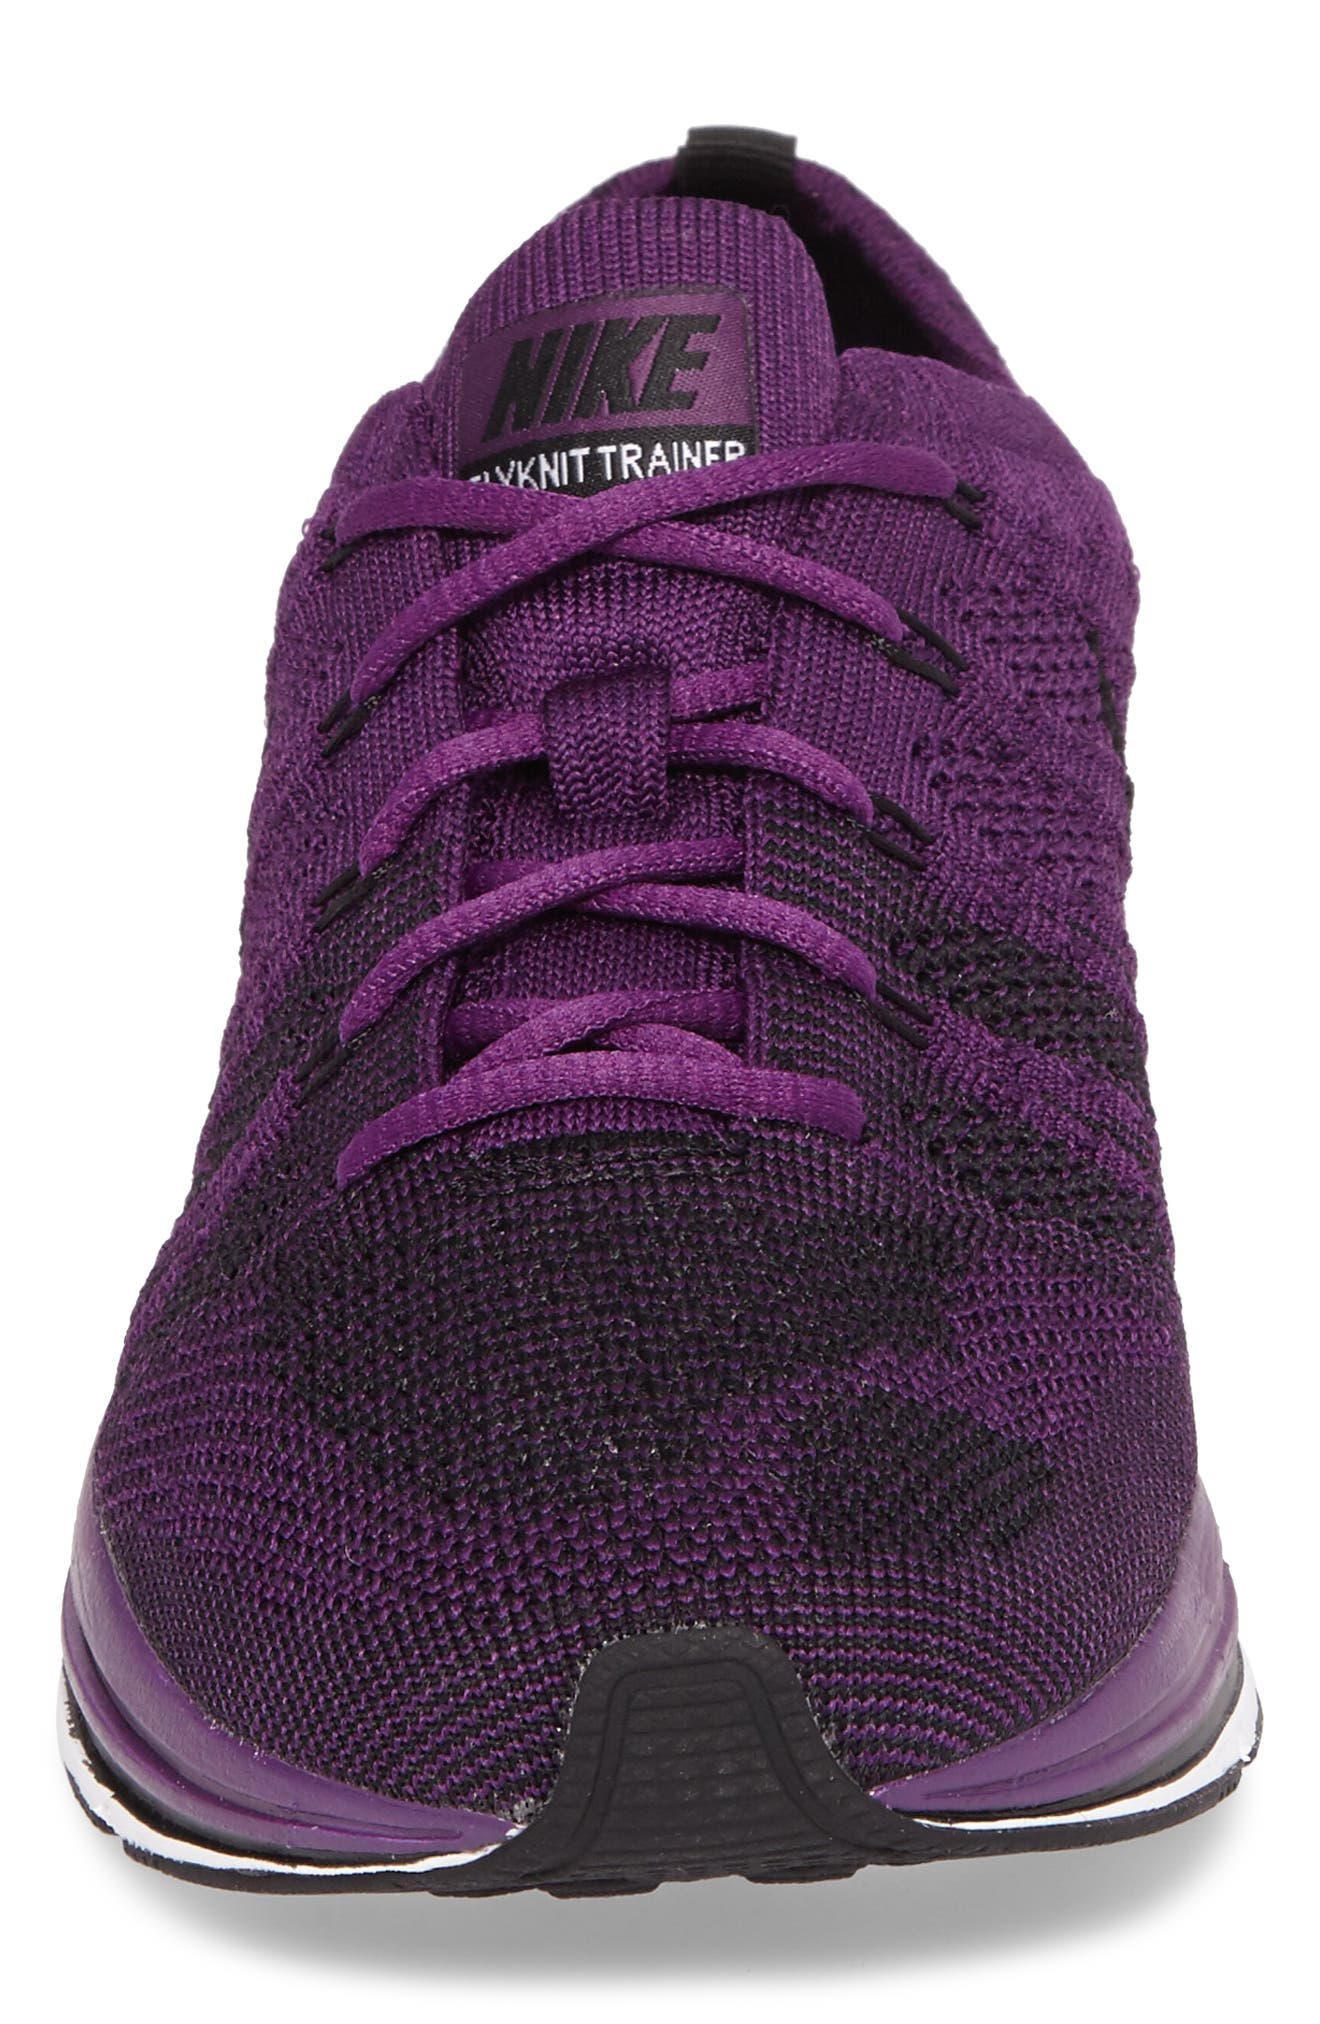 NikeLab Flyknit Trainer Sneaker,                             Alternate thumbnail 4, color,                             NIGHT PURPLE/ BLACK/ WHITE